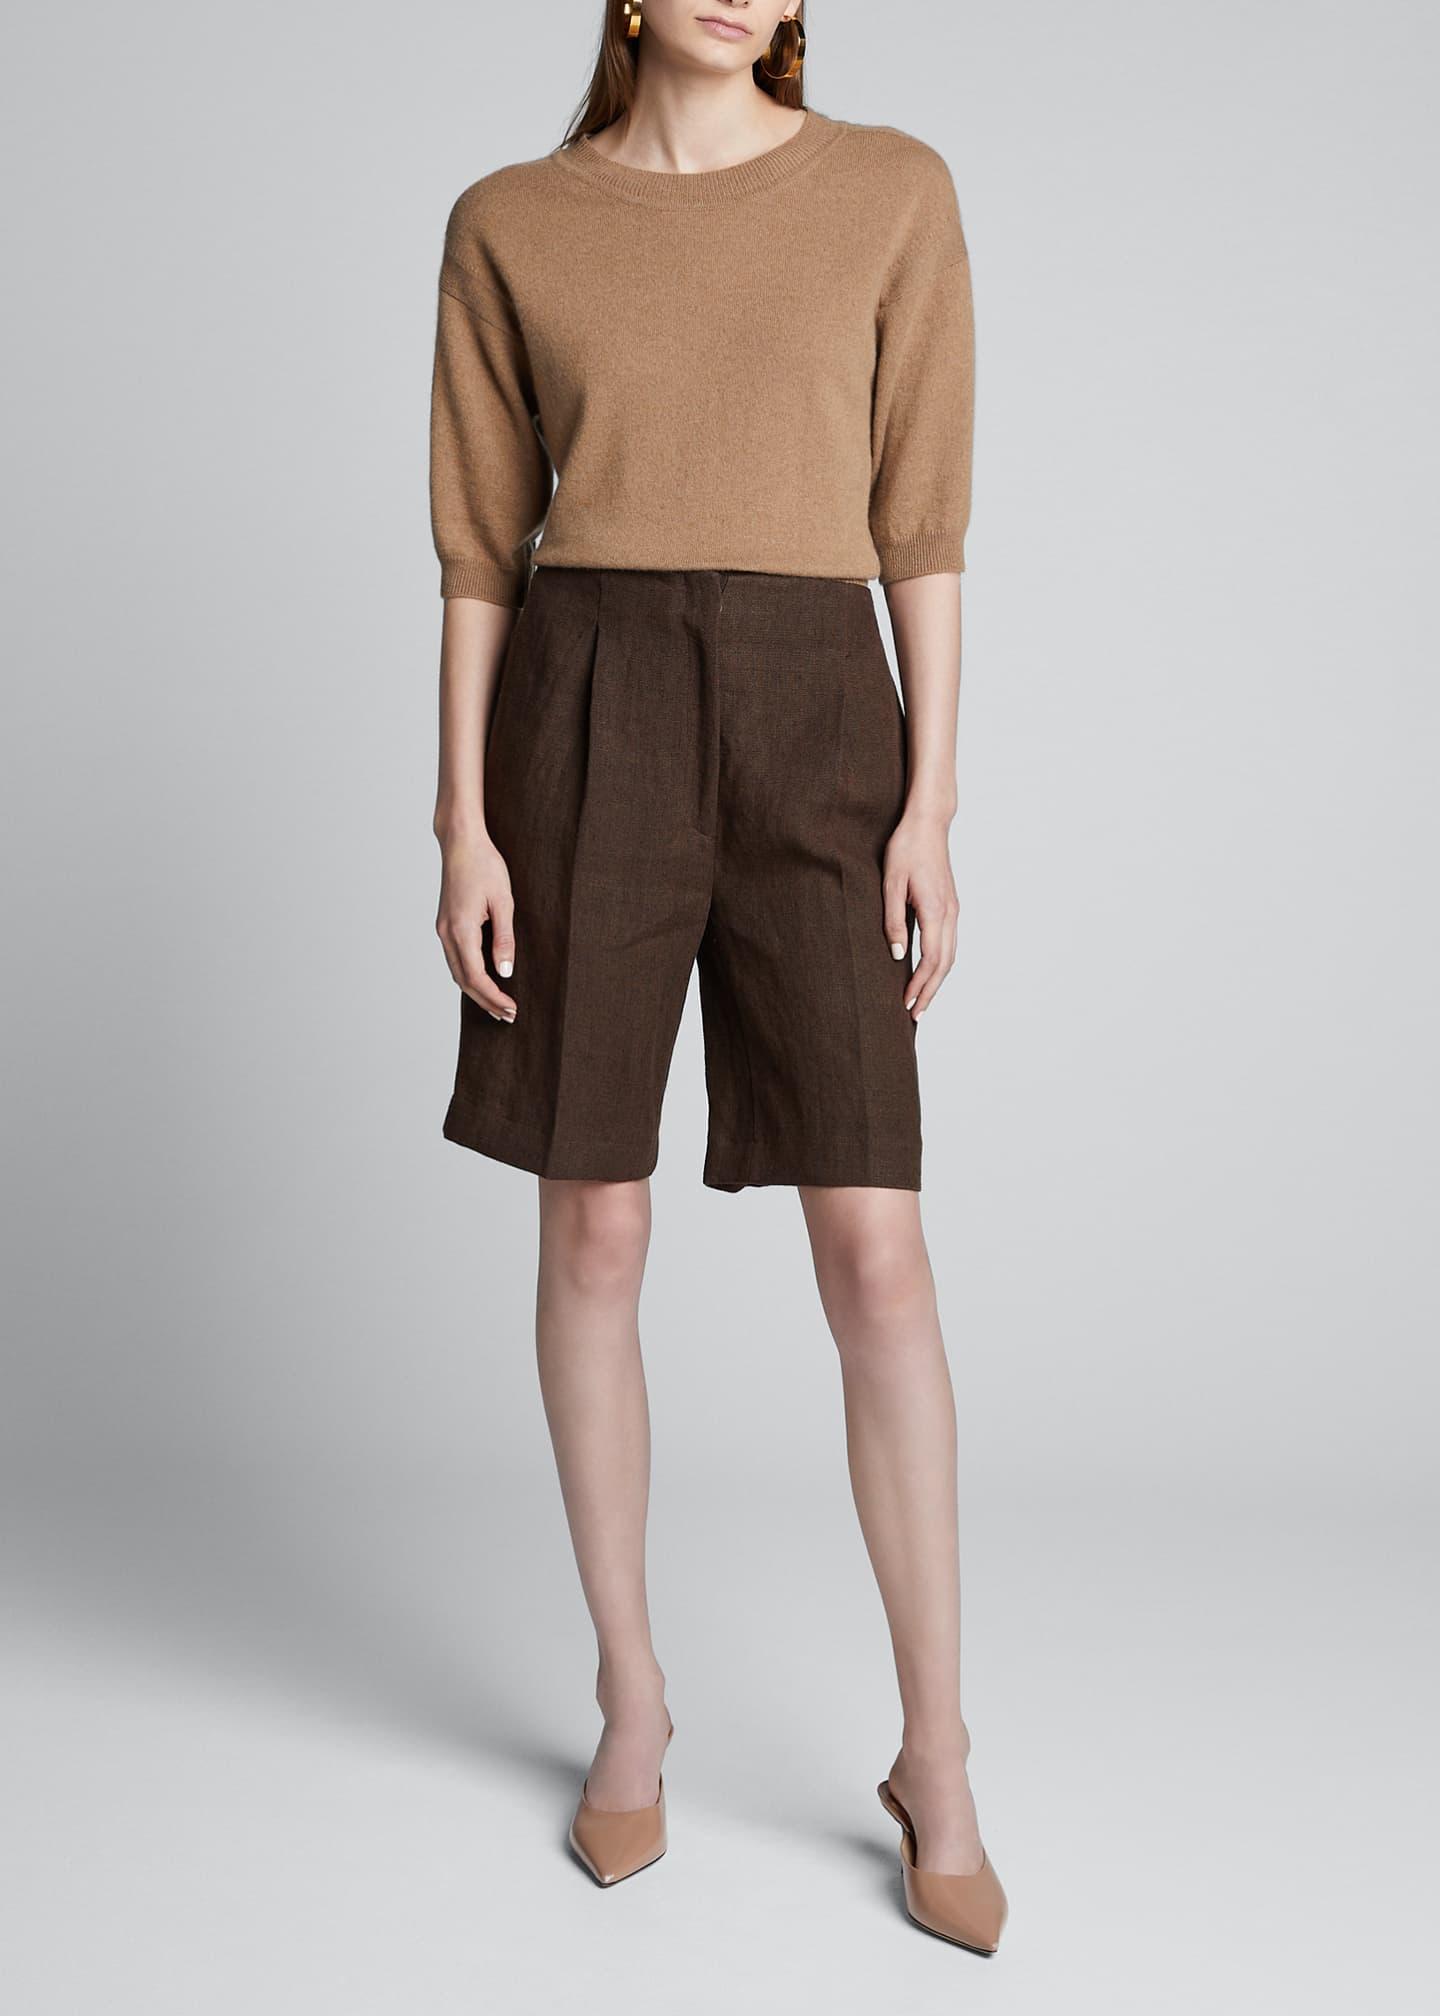 Loulou Studio Heavy Linen Knee Shorts